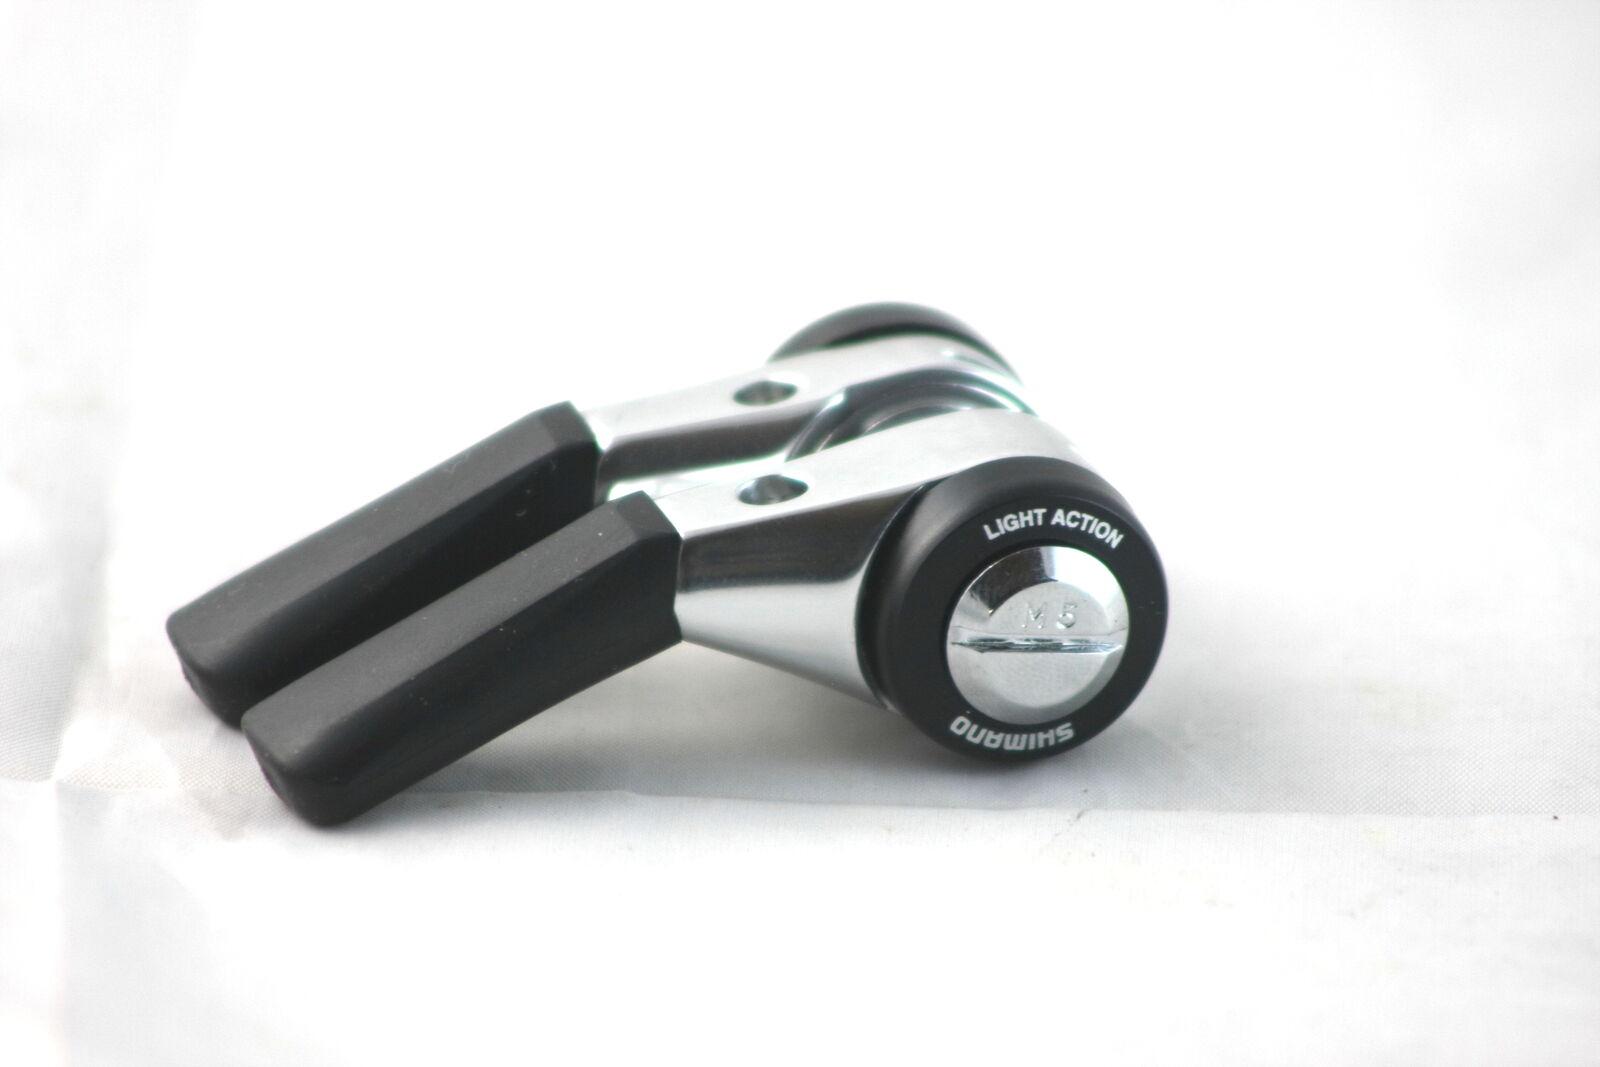 Shimano dura ace deputising-schalthebel set sl-bs79 2-3f 10f;  no support  high discount